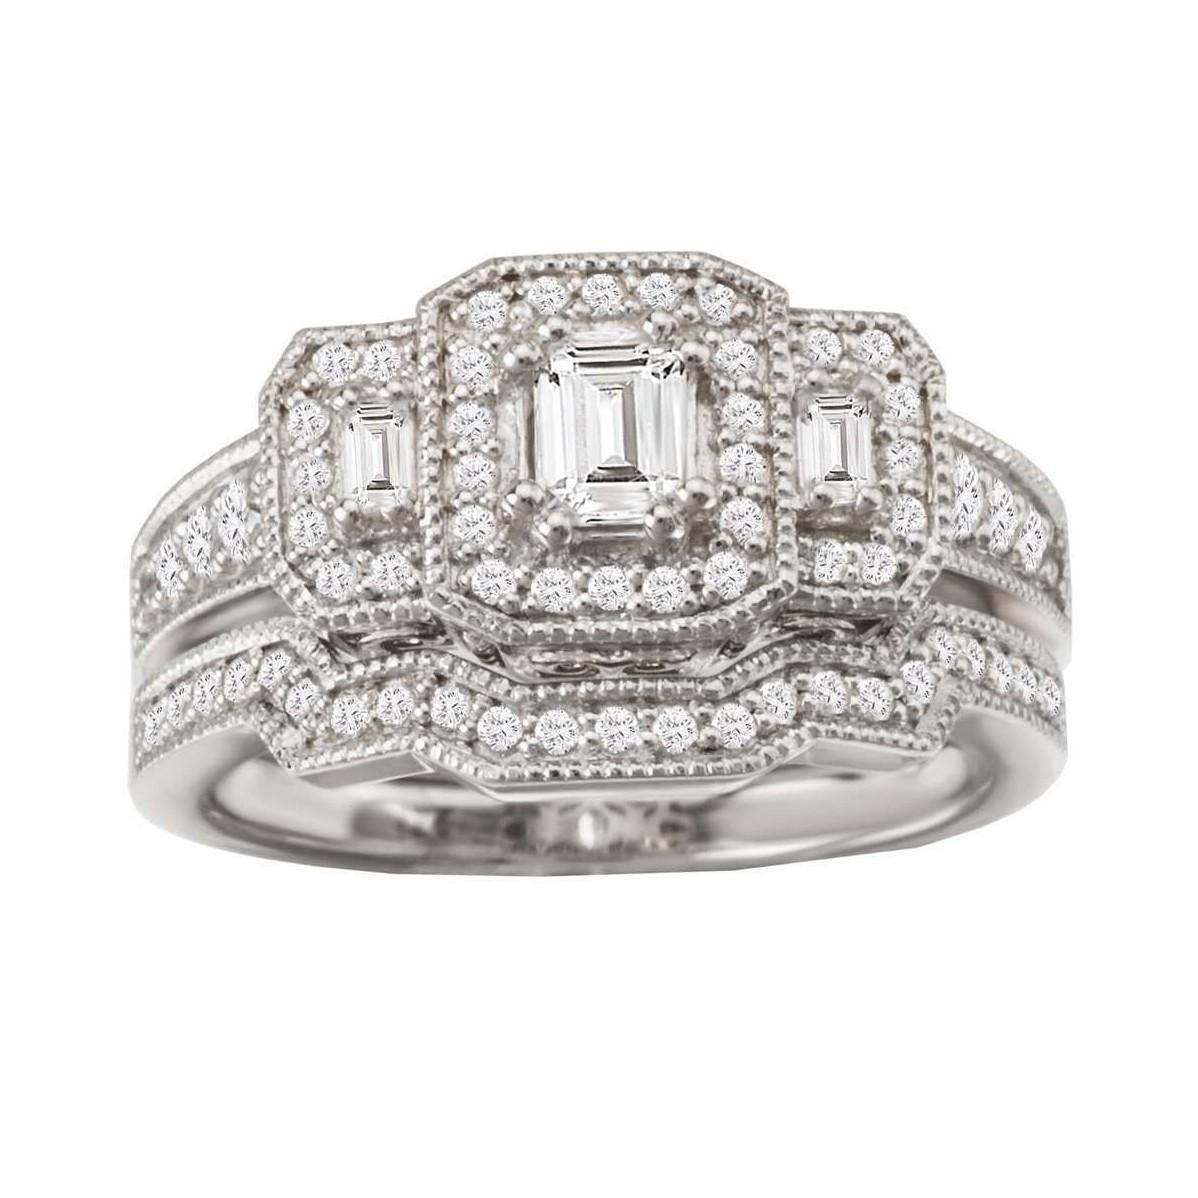 Emerald Cut White Sapphire Sterling Silver Halo 3-Stone Bridal Sets